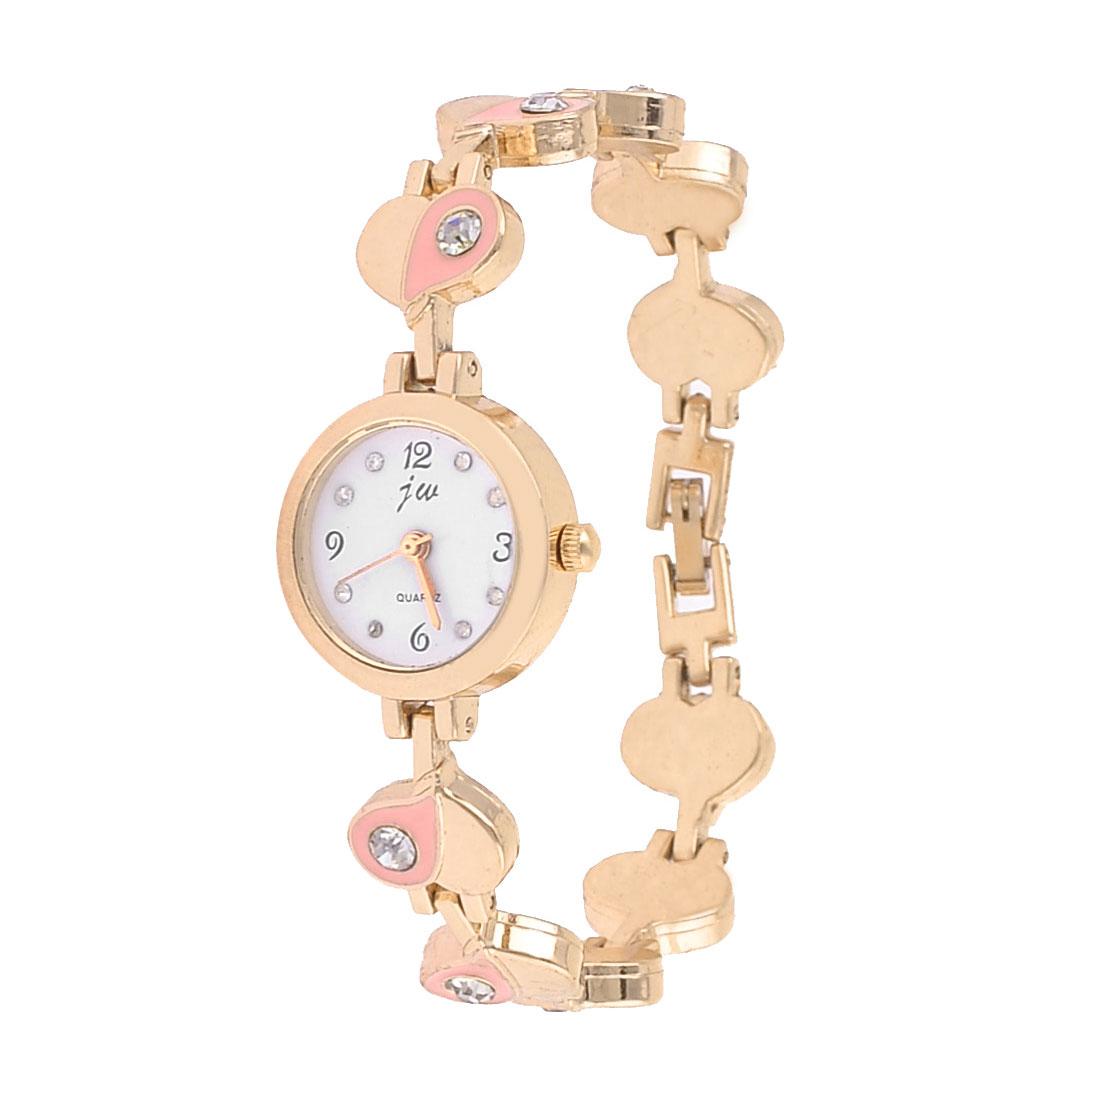 Women Rhinestones Inlaid Heart Chain Wristband Watch Copper Tone Pink